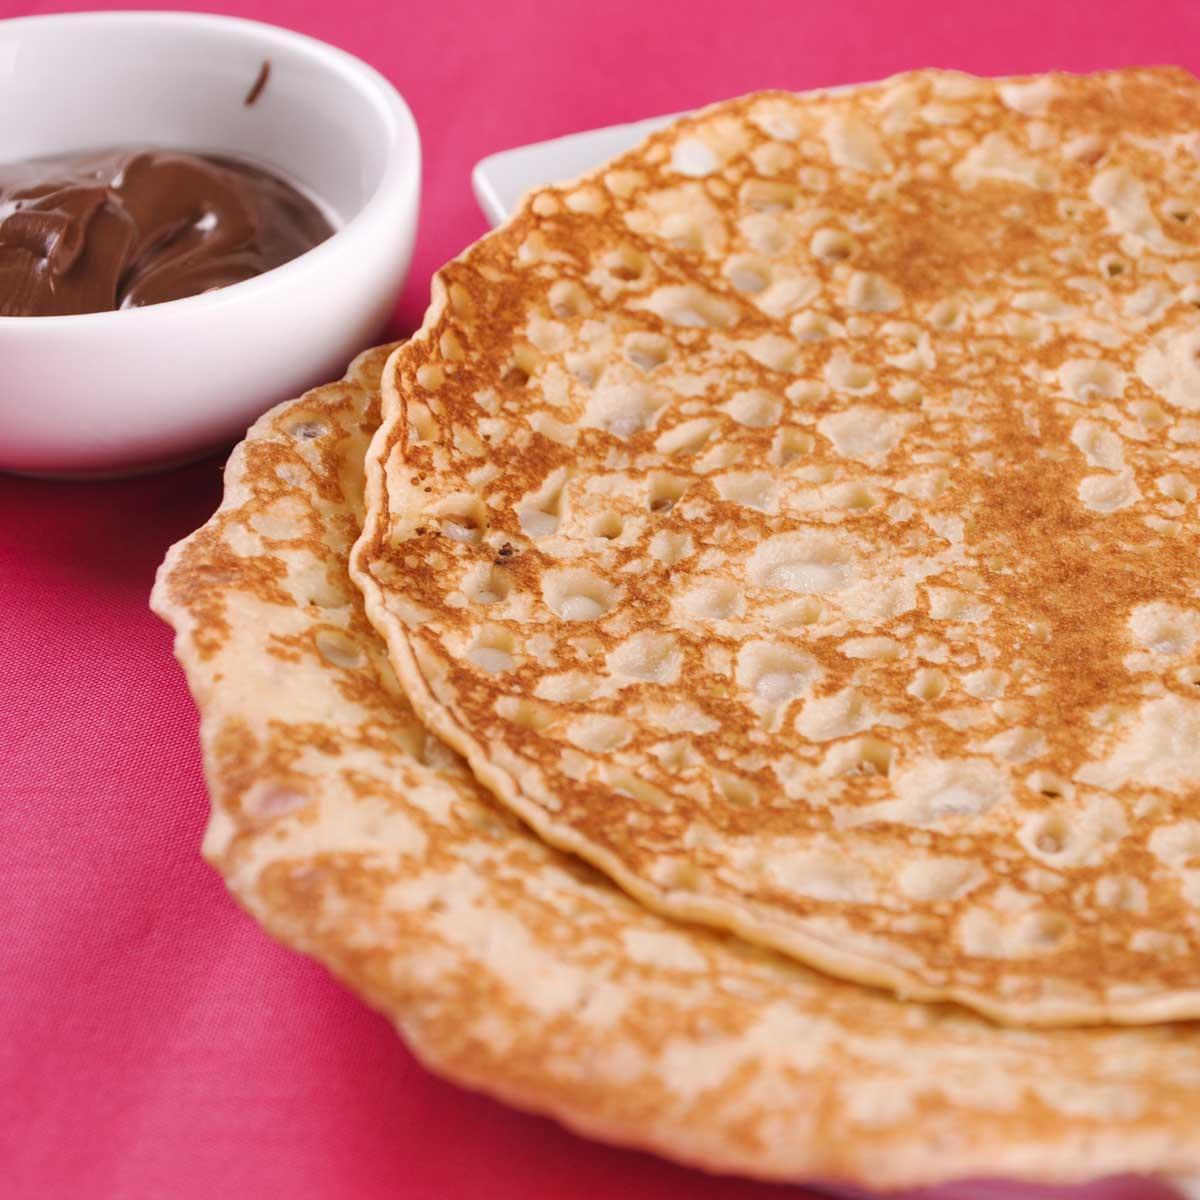 p 226 te 224 cr 234 pes sucr 233 e sans gluten ni œuf ni lait une recette f 234 te cuisine le figaro madame